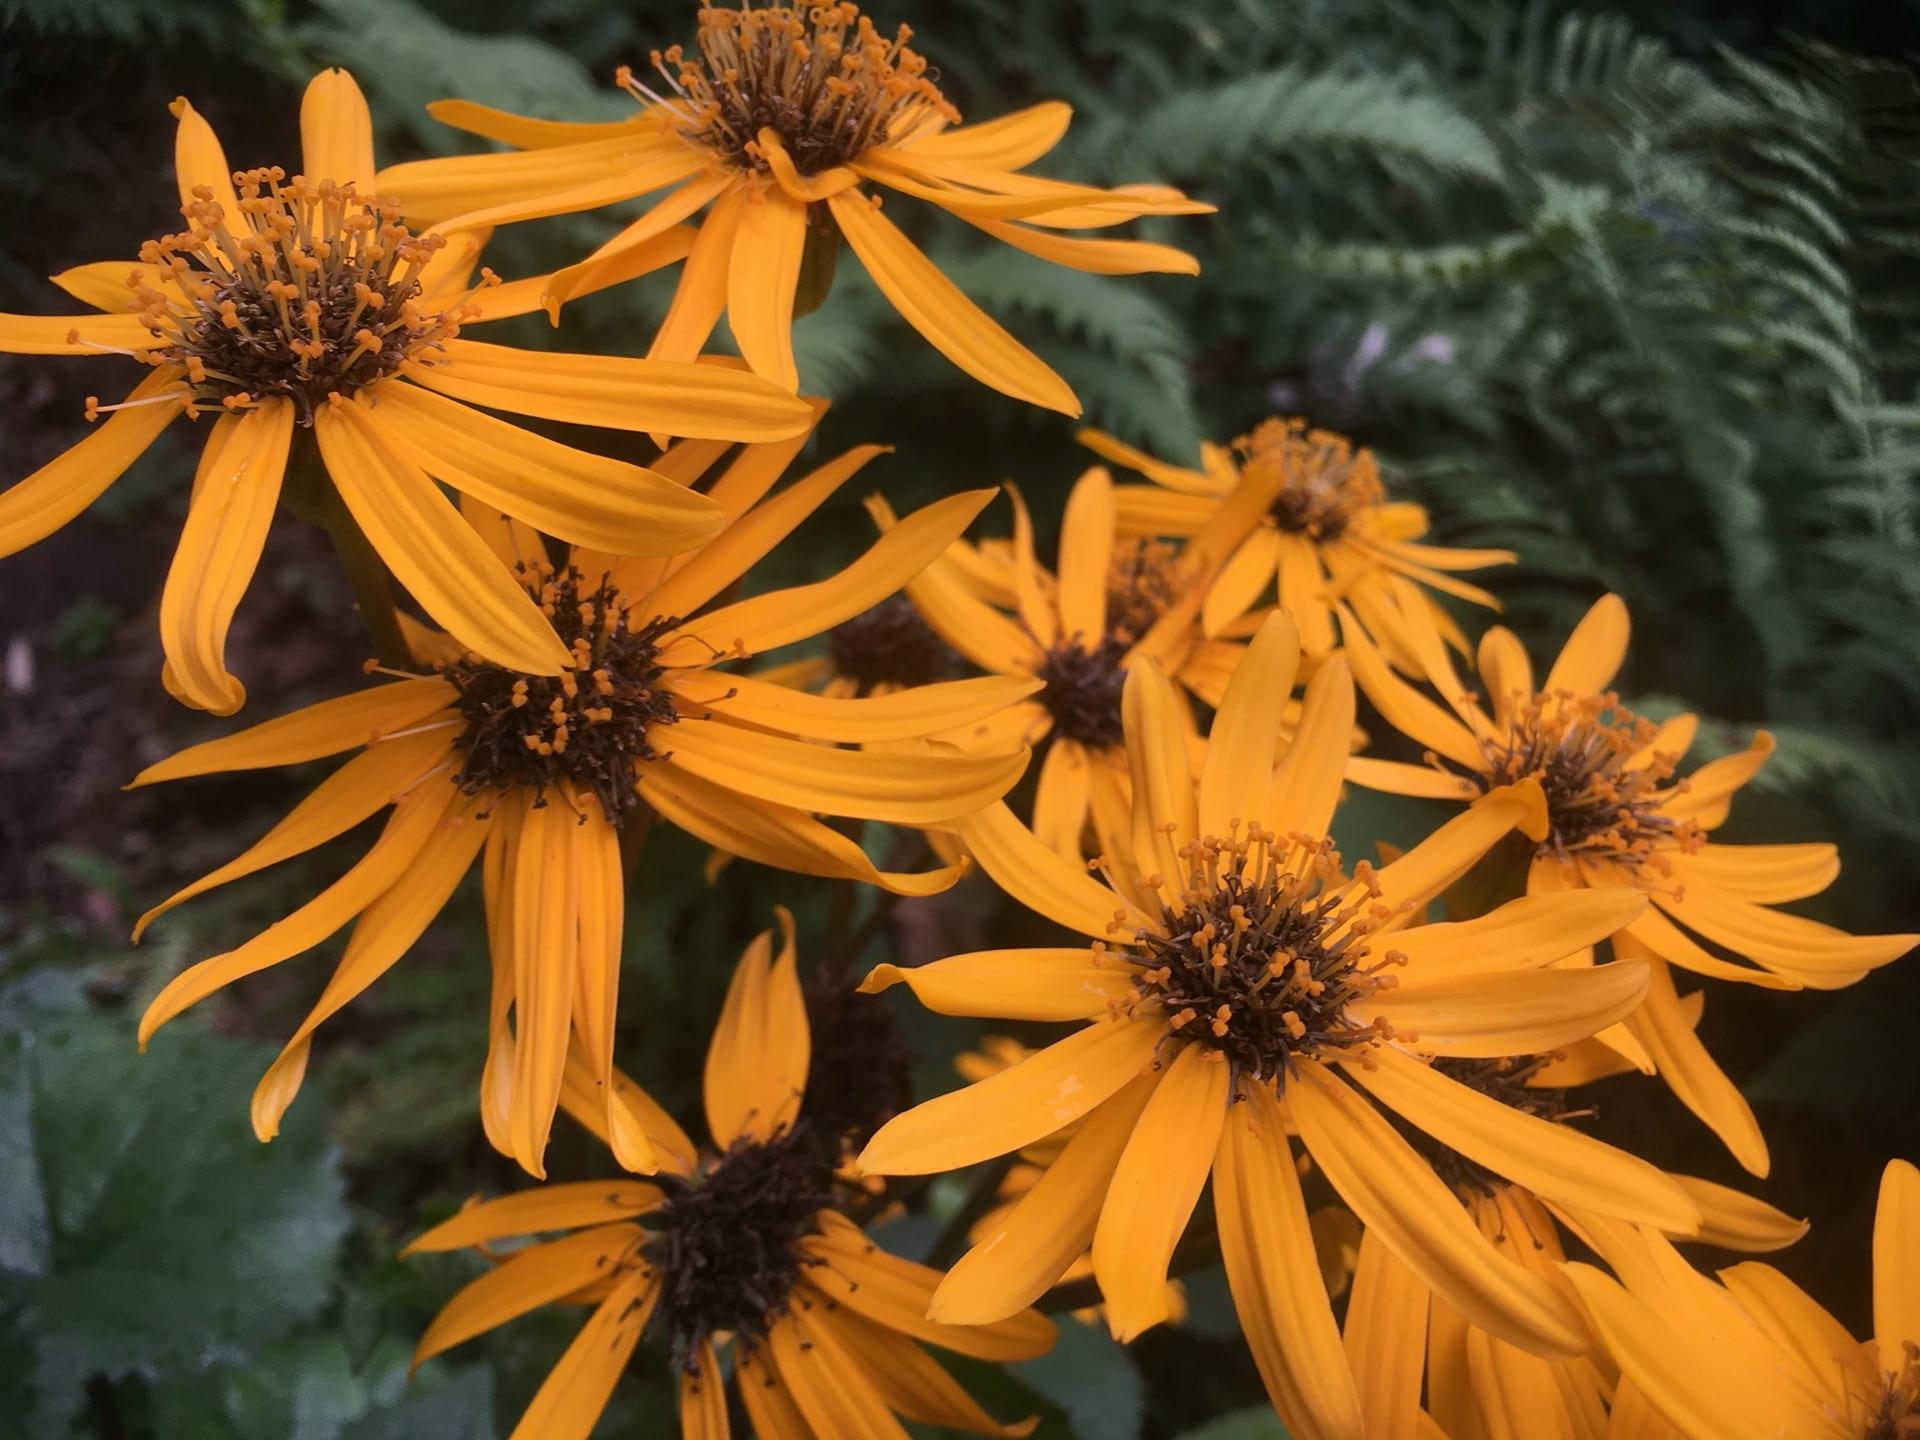 The neon orange flowers of Ligularia dentata brightens a shady corner of the park.